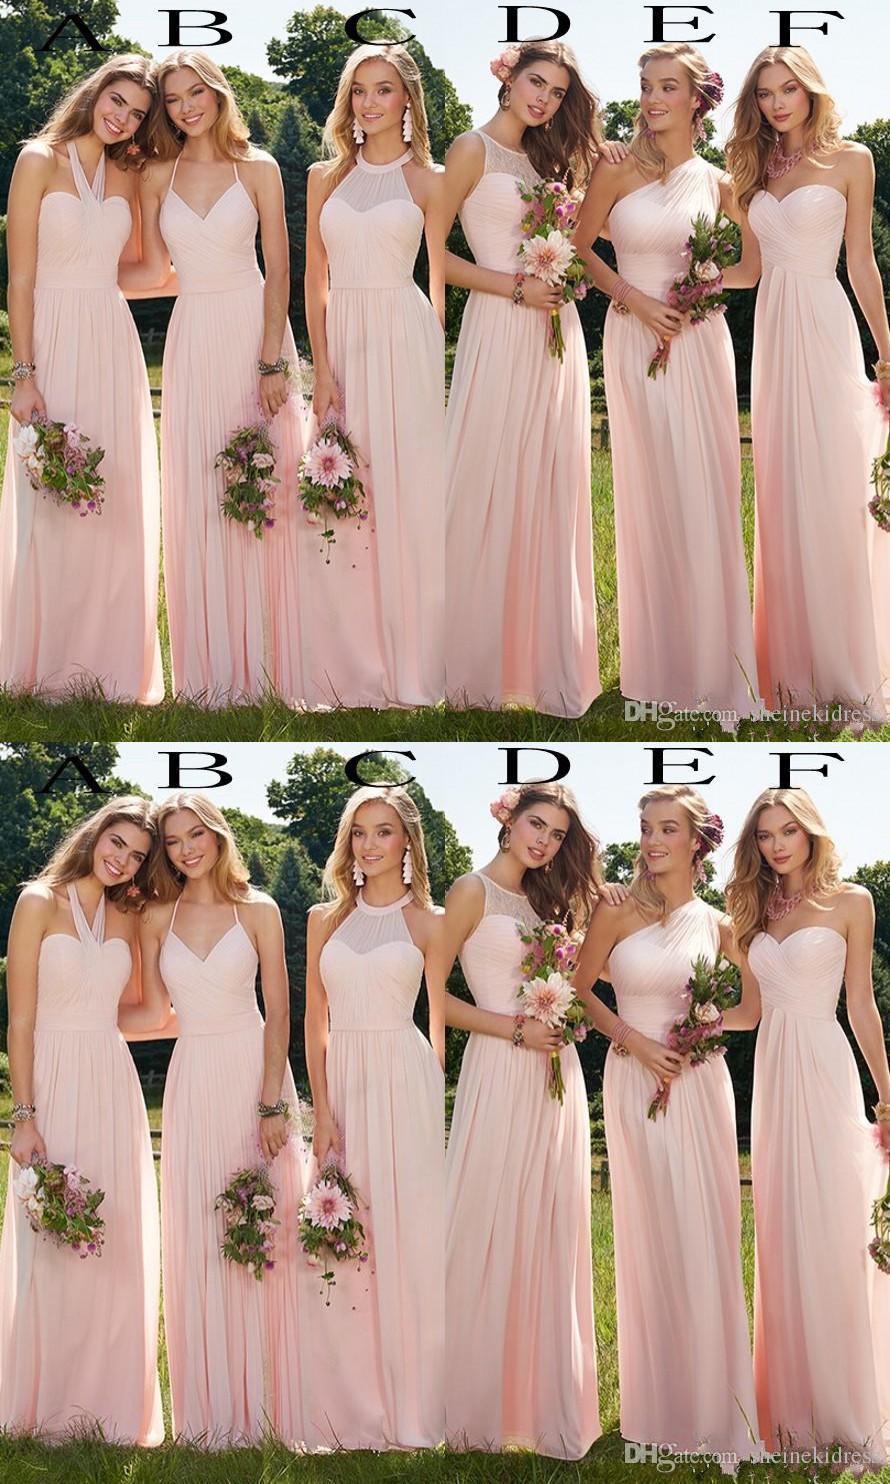 Summer 2019 Cheap Blush Chiffon Long Bridesmaid Dresses Boho Bridesmaid Dress For Beach Prom Party Ruffles Wedding Guest Gowns Custom Made Lv1258 From